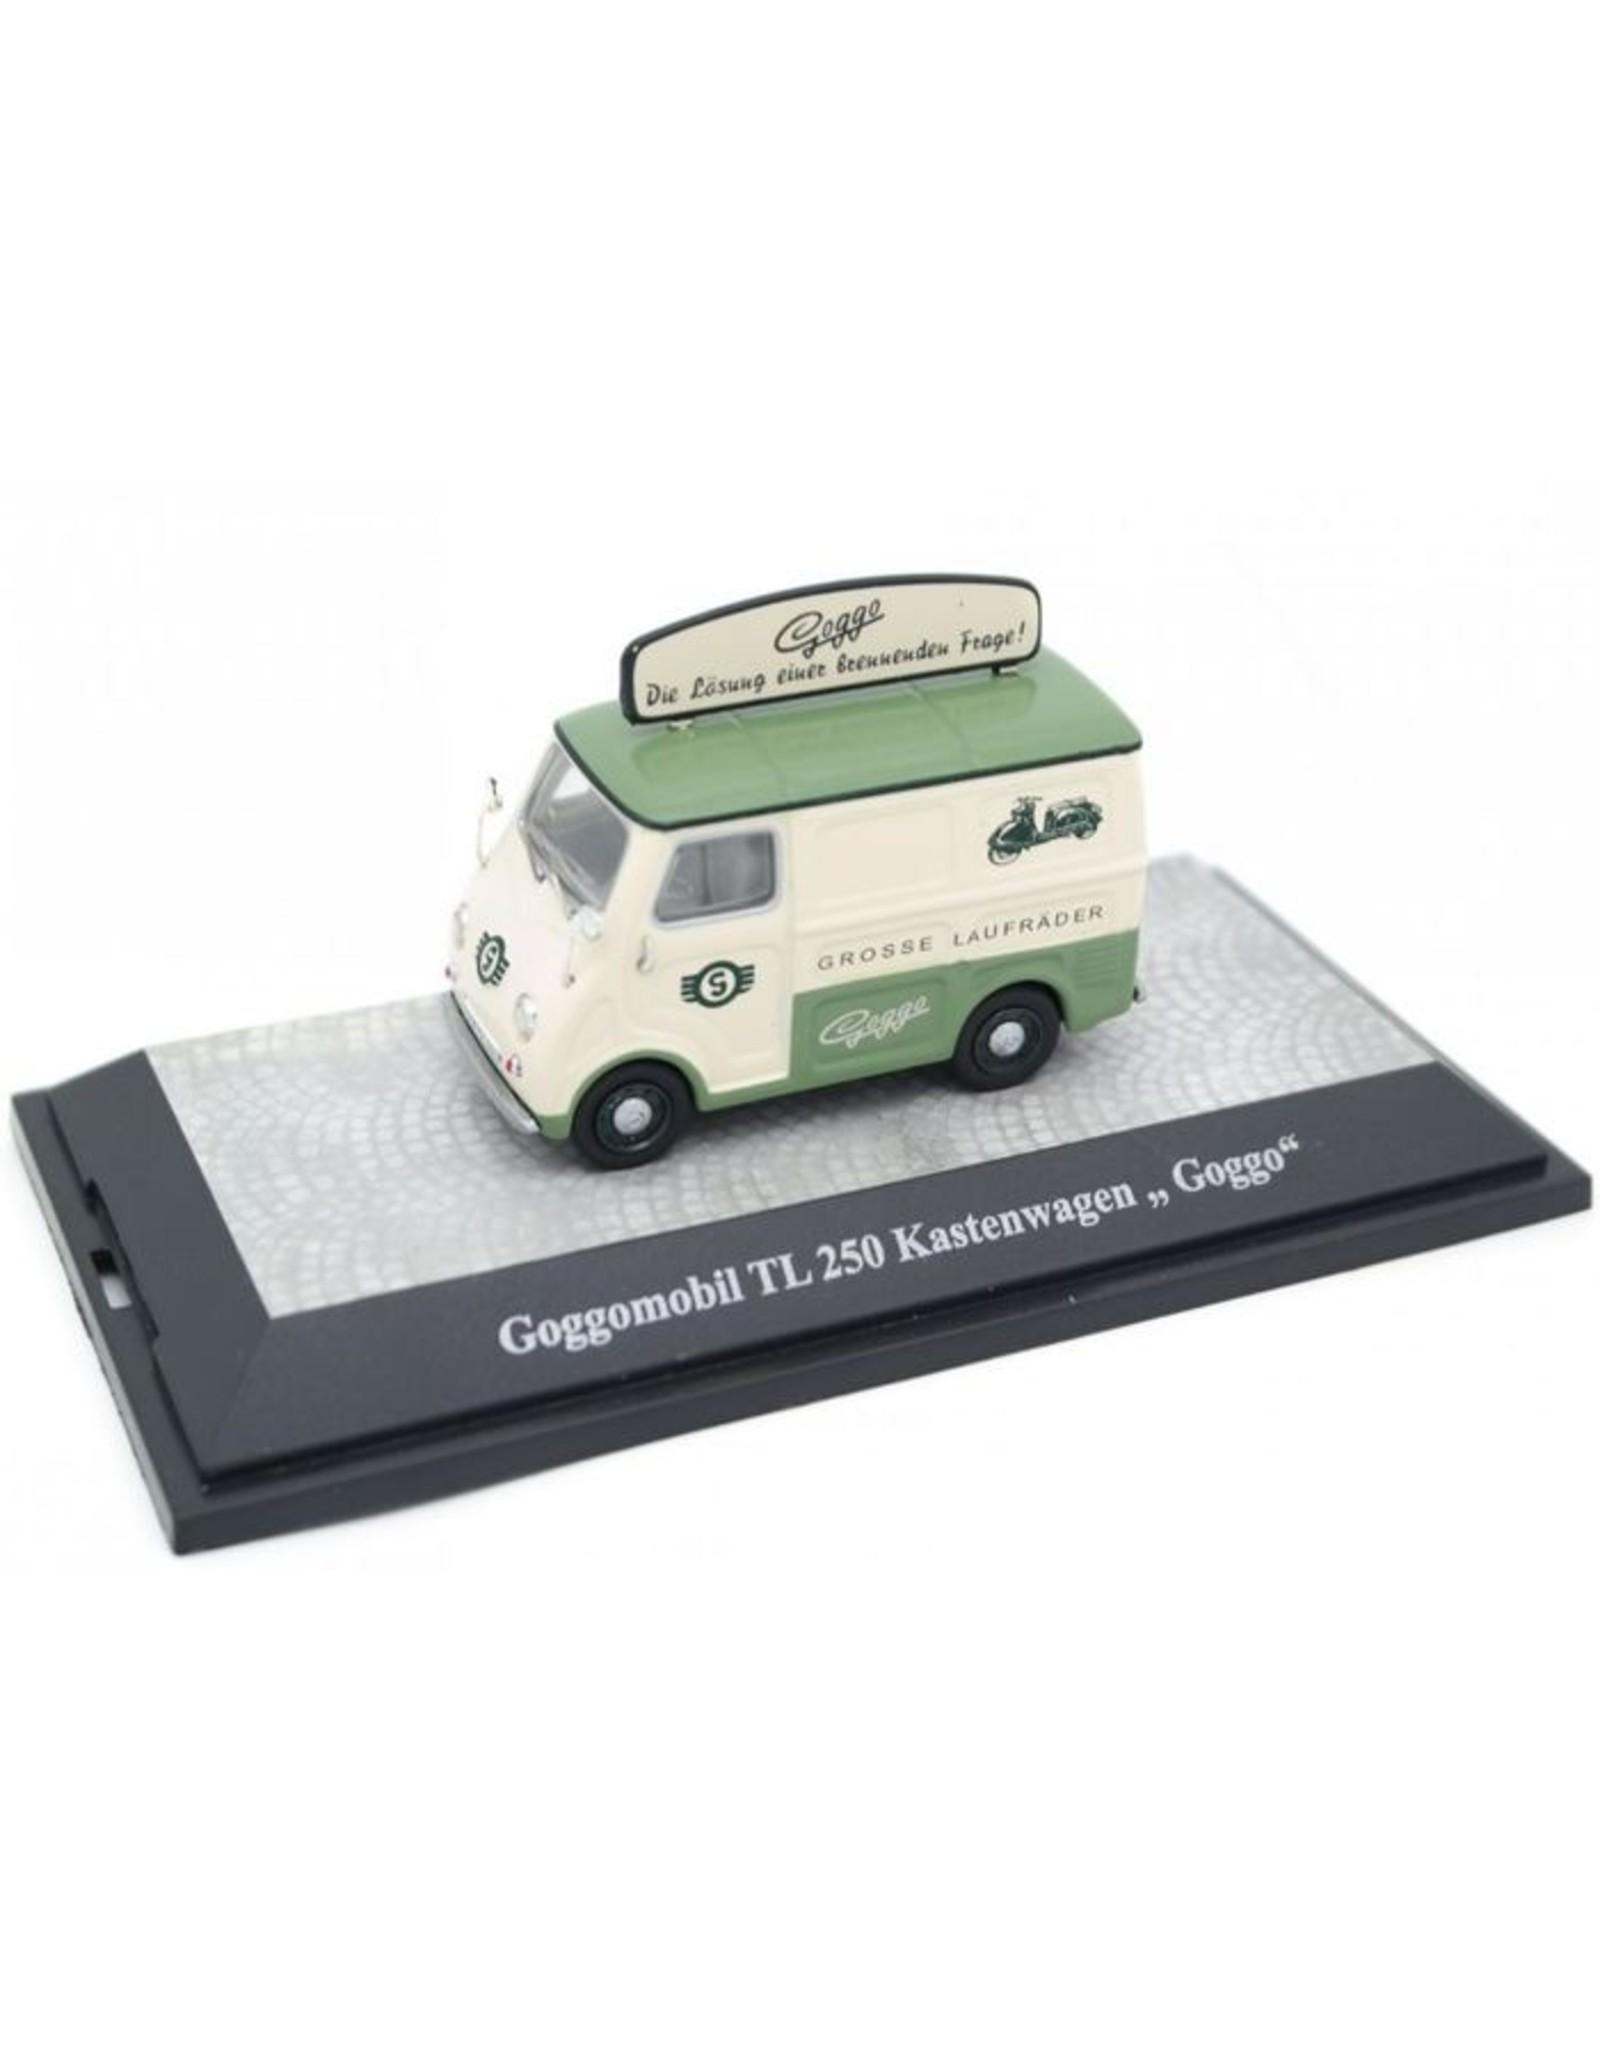 Goggomobil Goggomobil TL 250 'Goggo' - 1:43 - Premium ClassiXXs